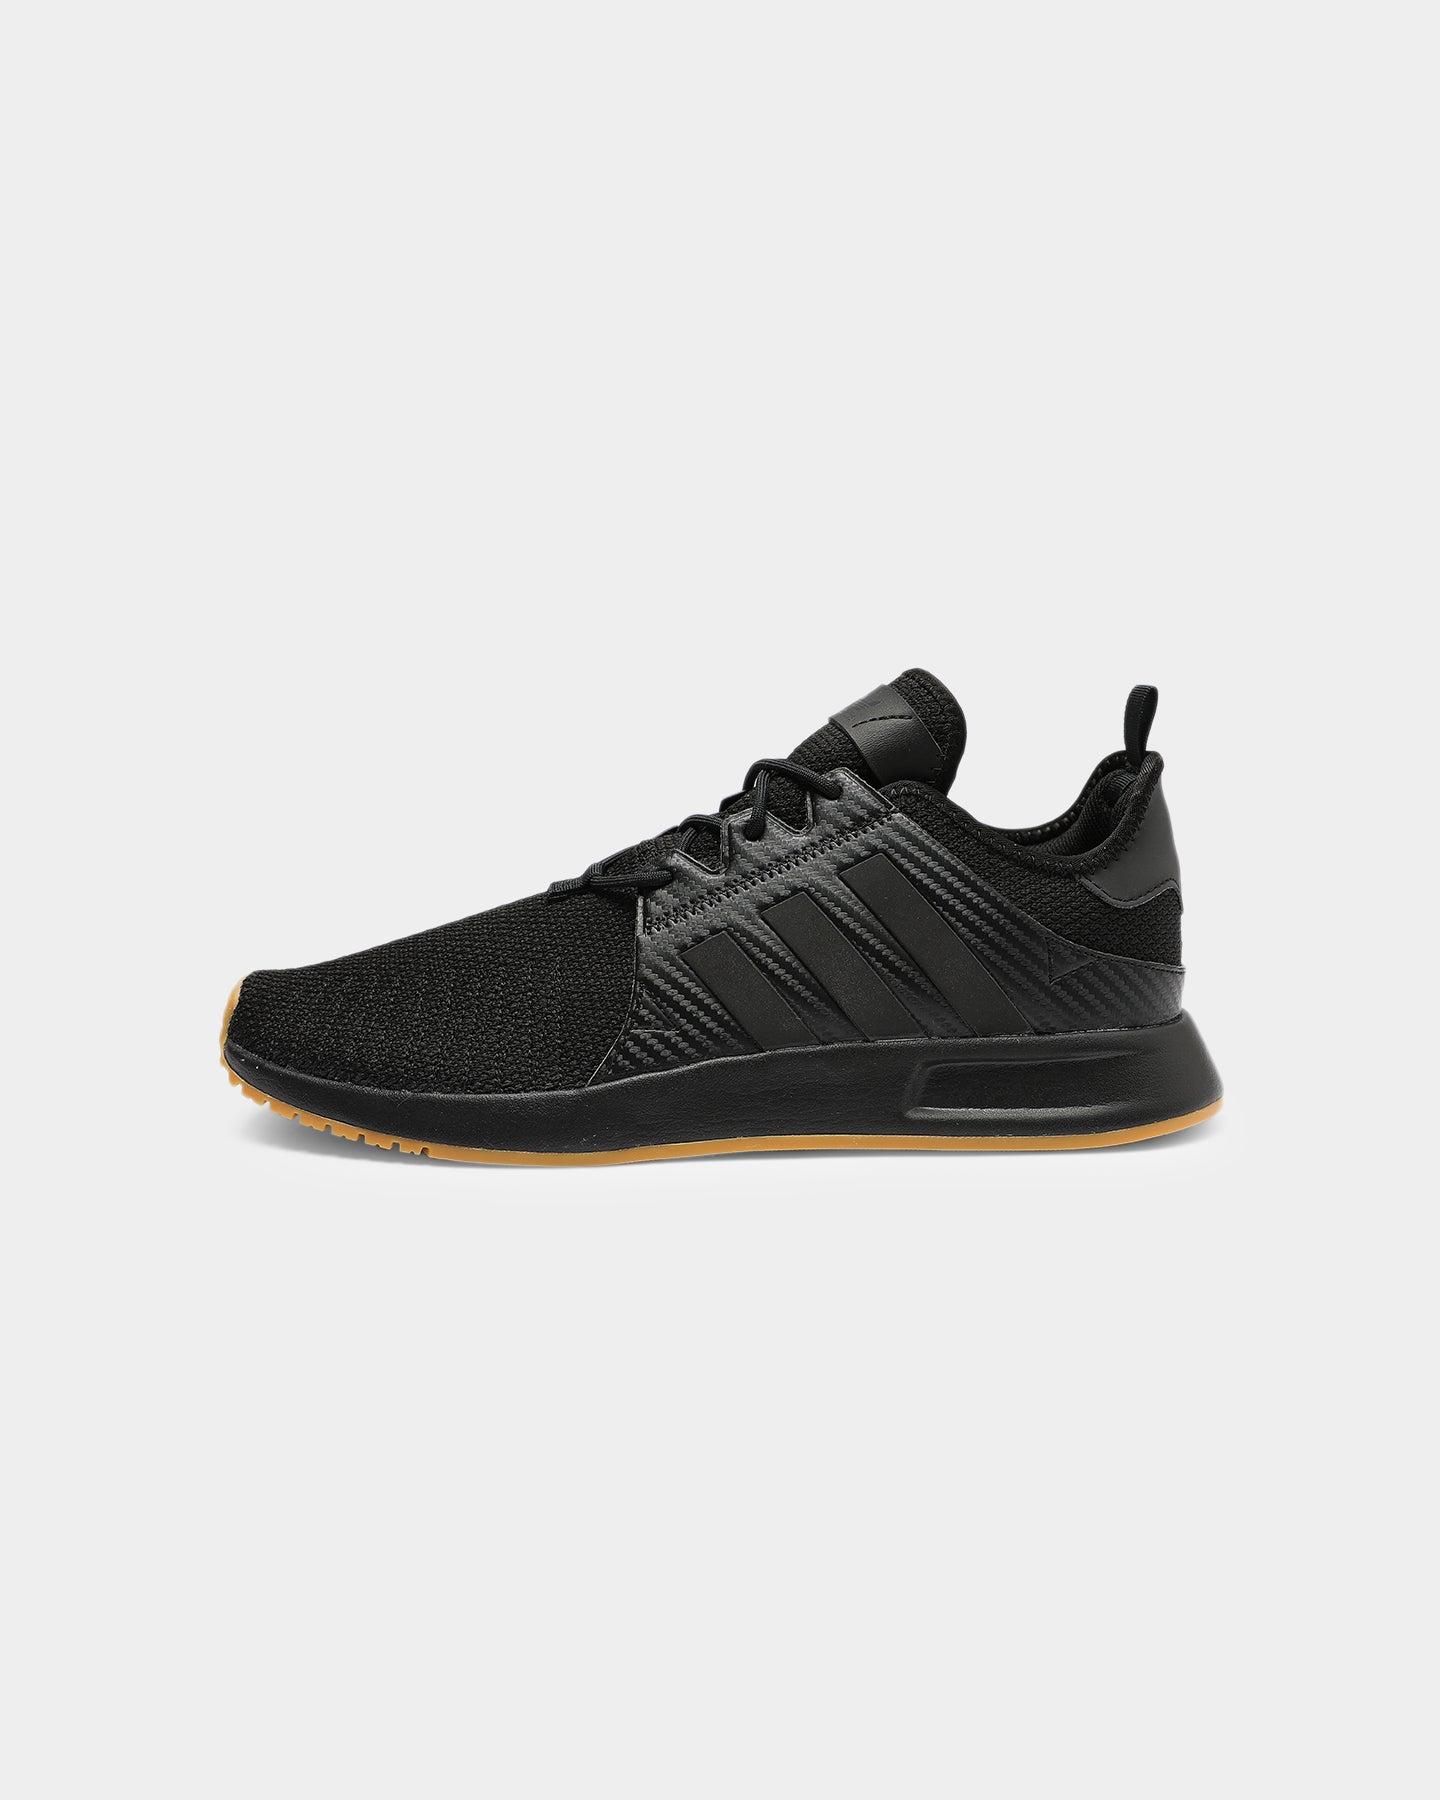 Adidas X_PLR Black/Gum | Culture Kings NZ